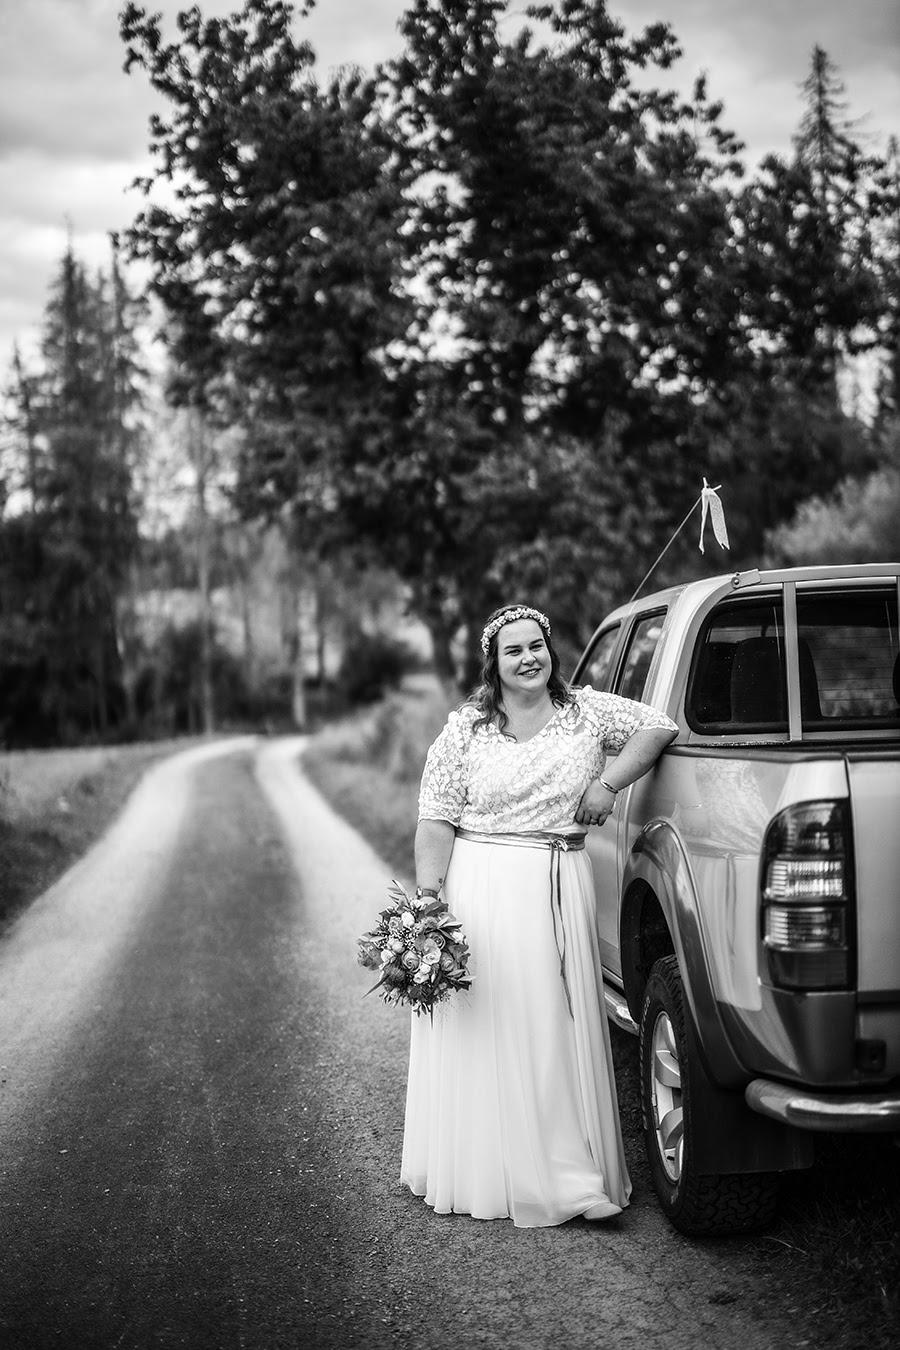 Braut neben Auto